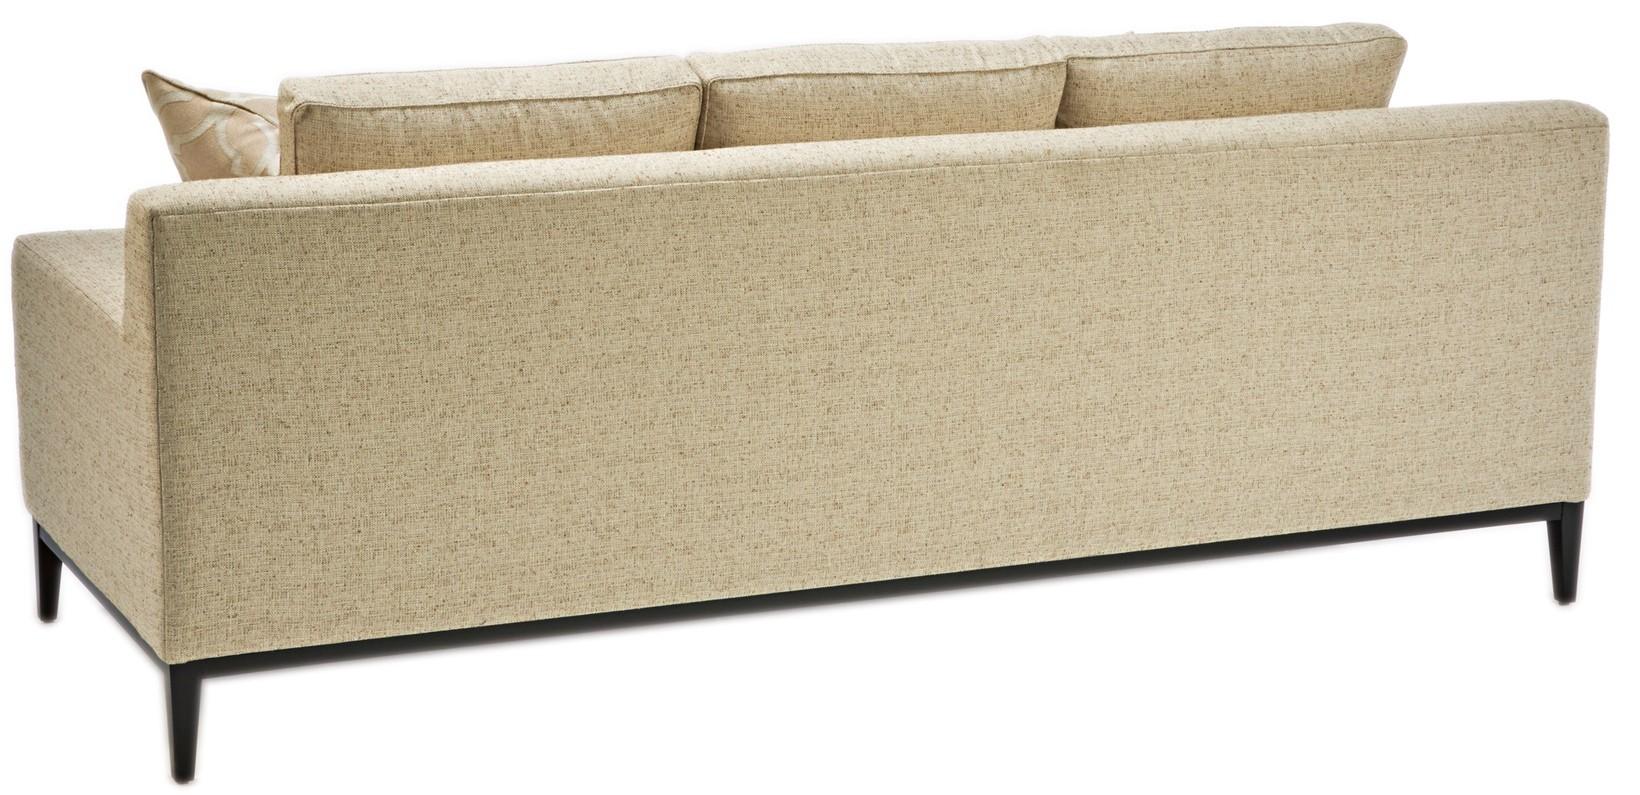 Fun and elegant modern style sofa